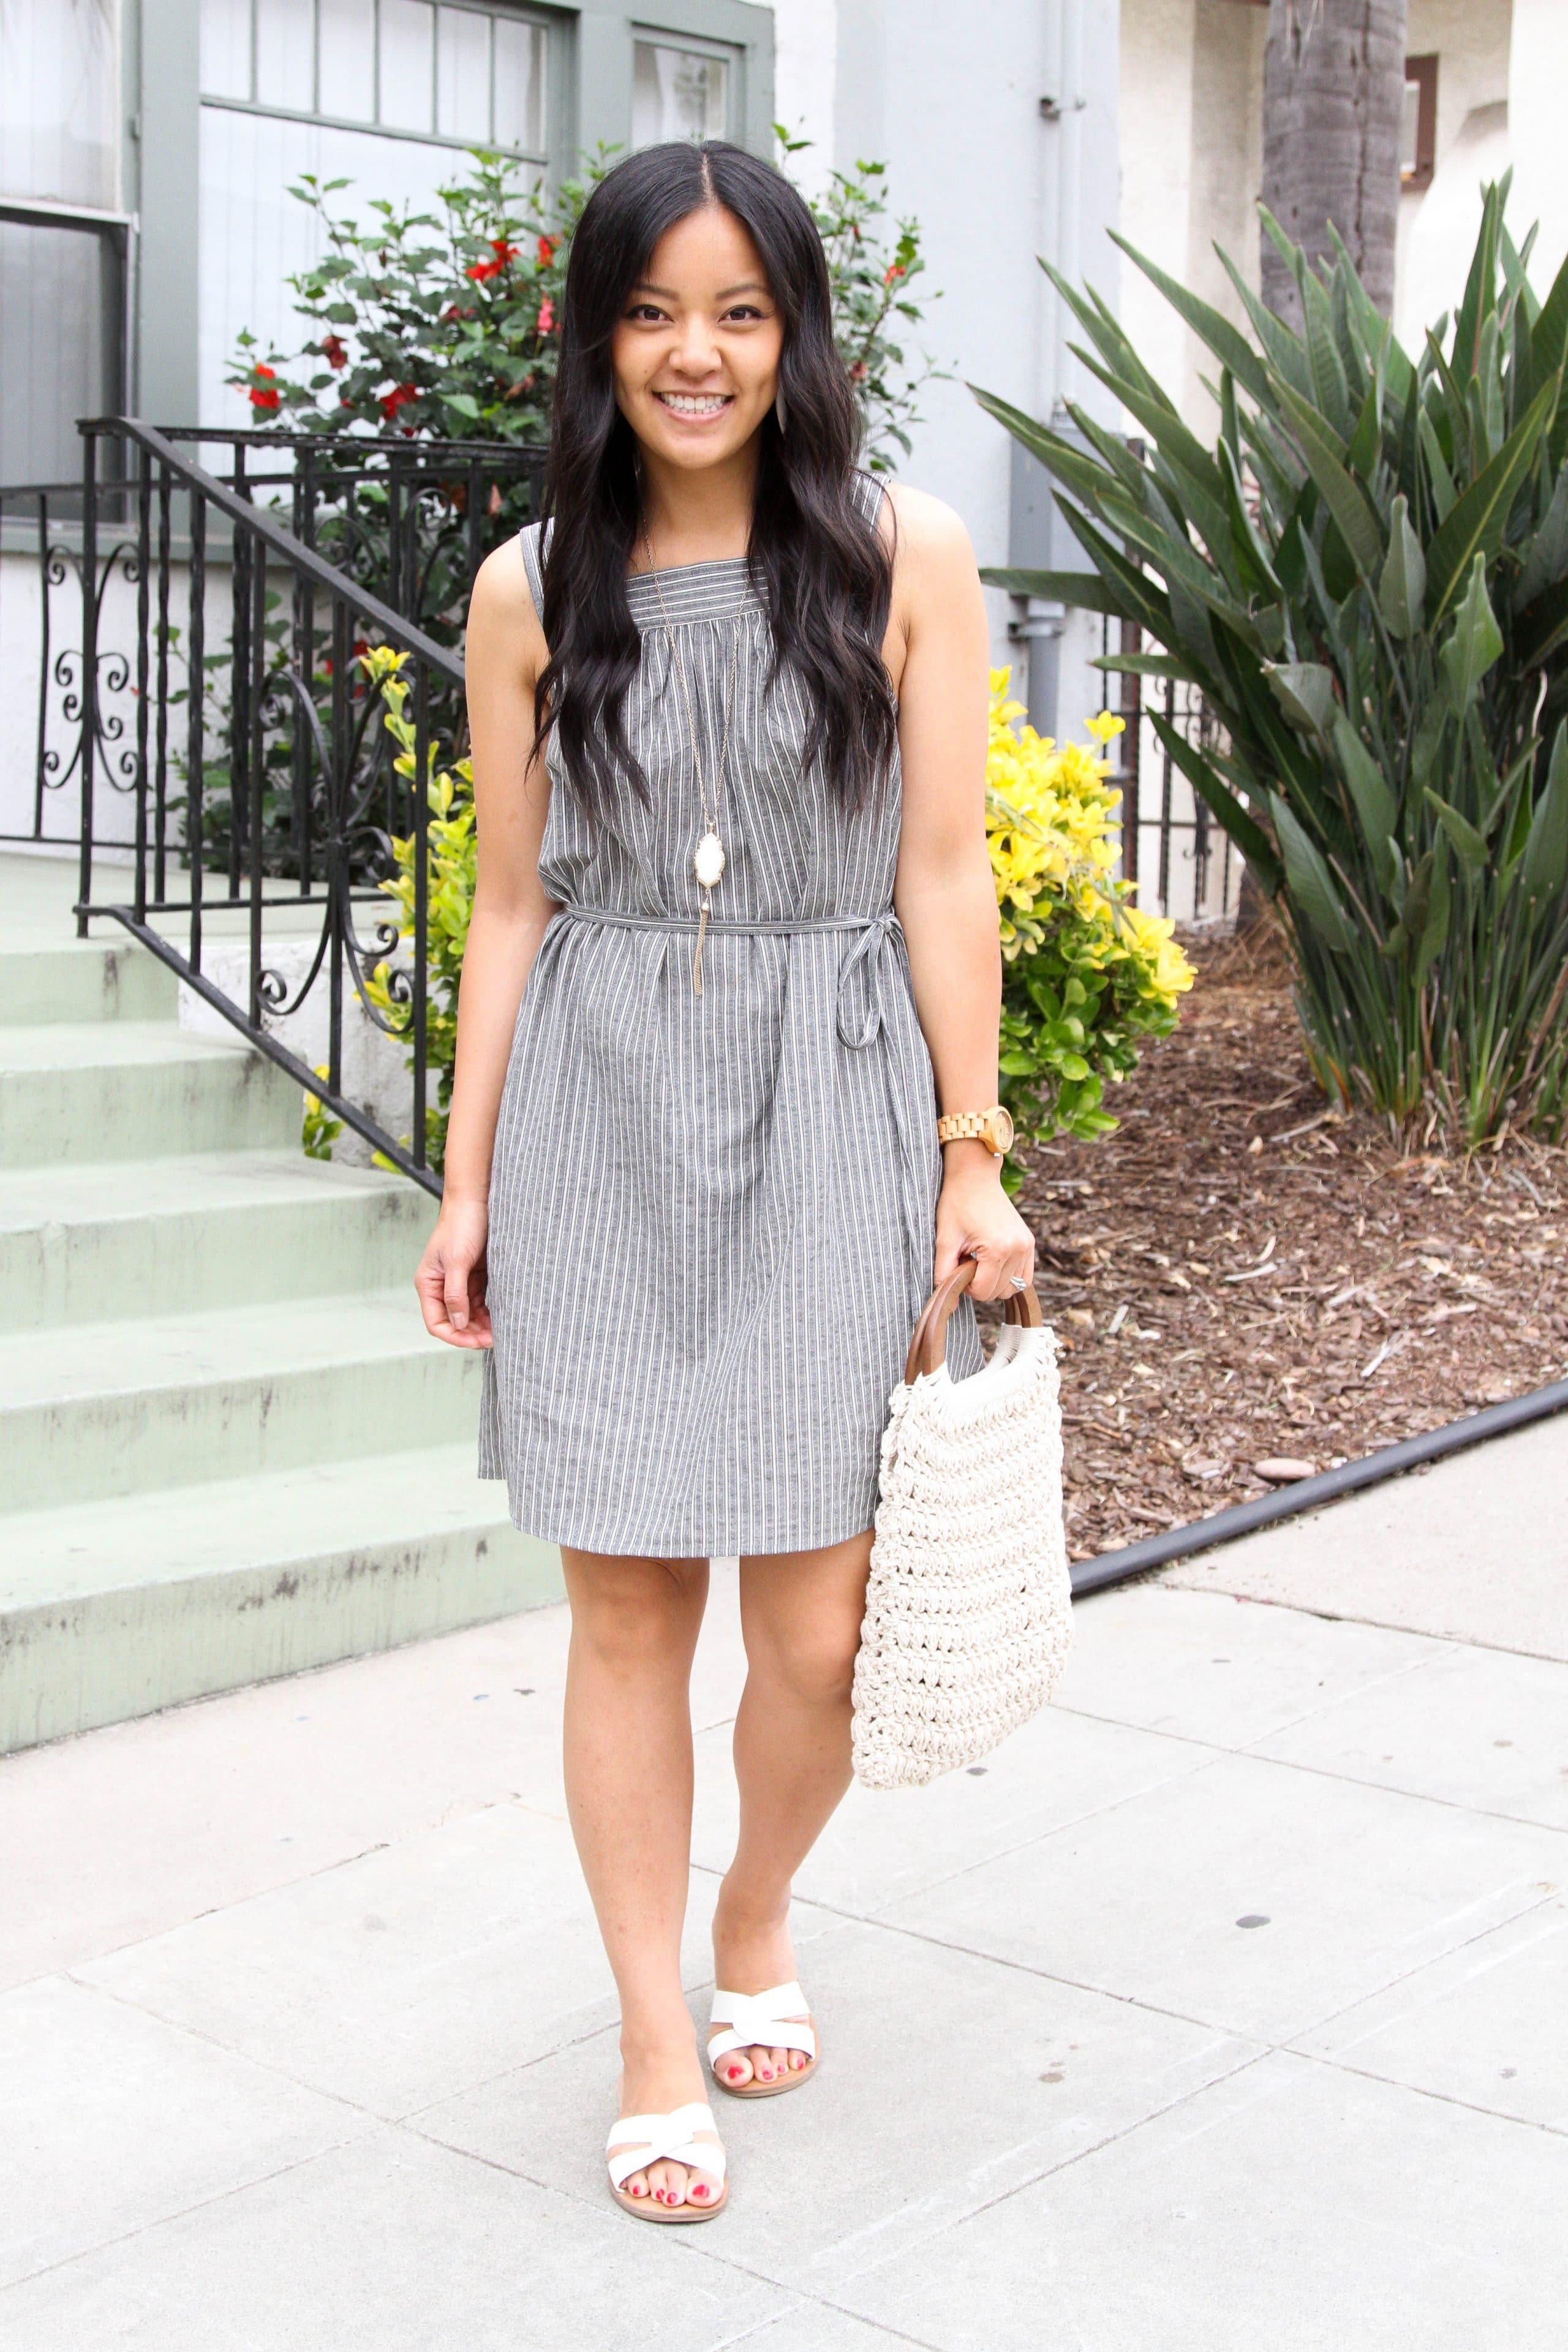 grey and white striped dress + white sandals + long pendant necklace + white macrame handbag